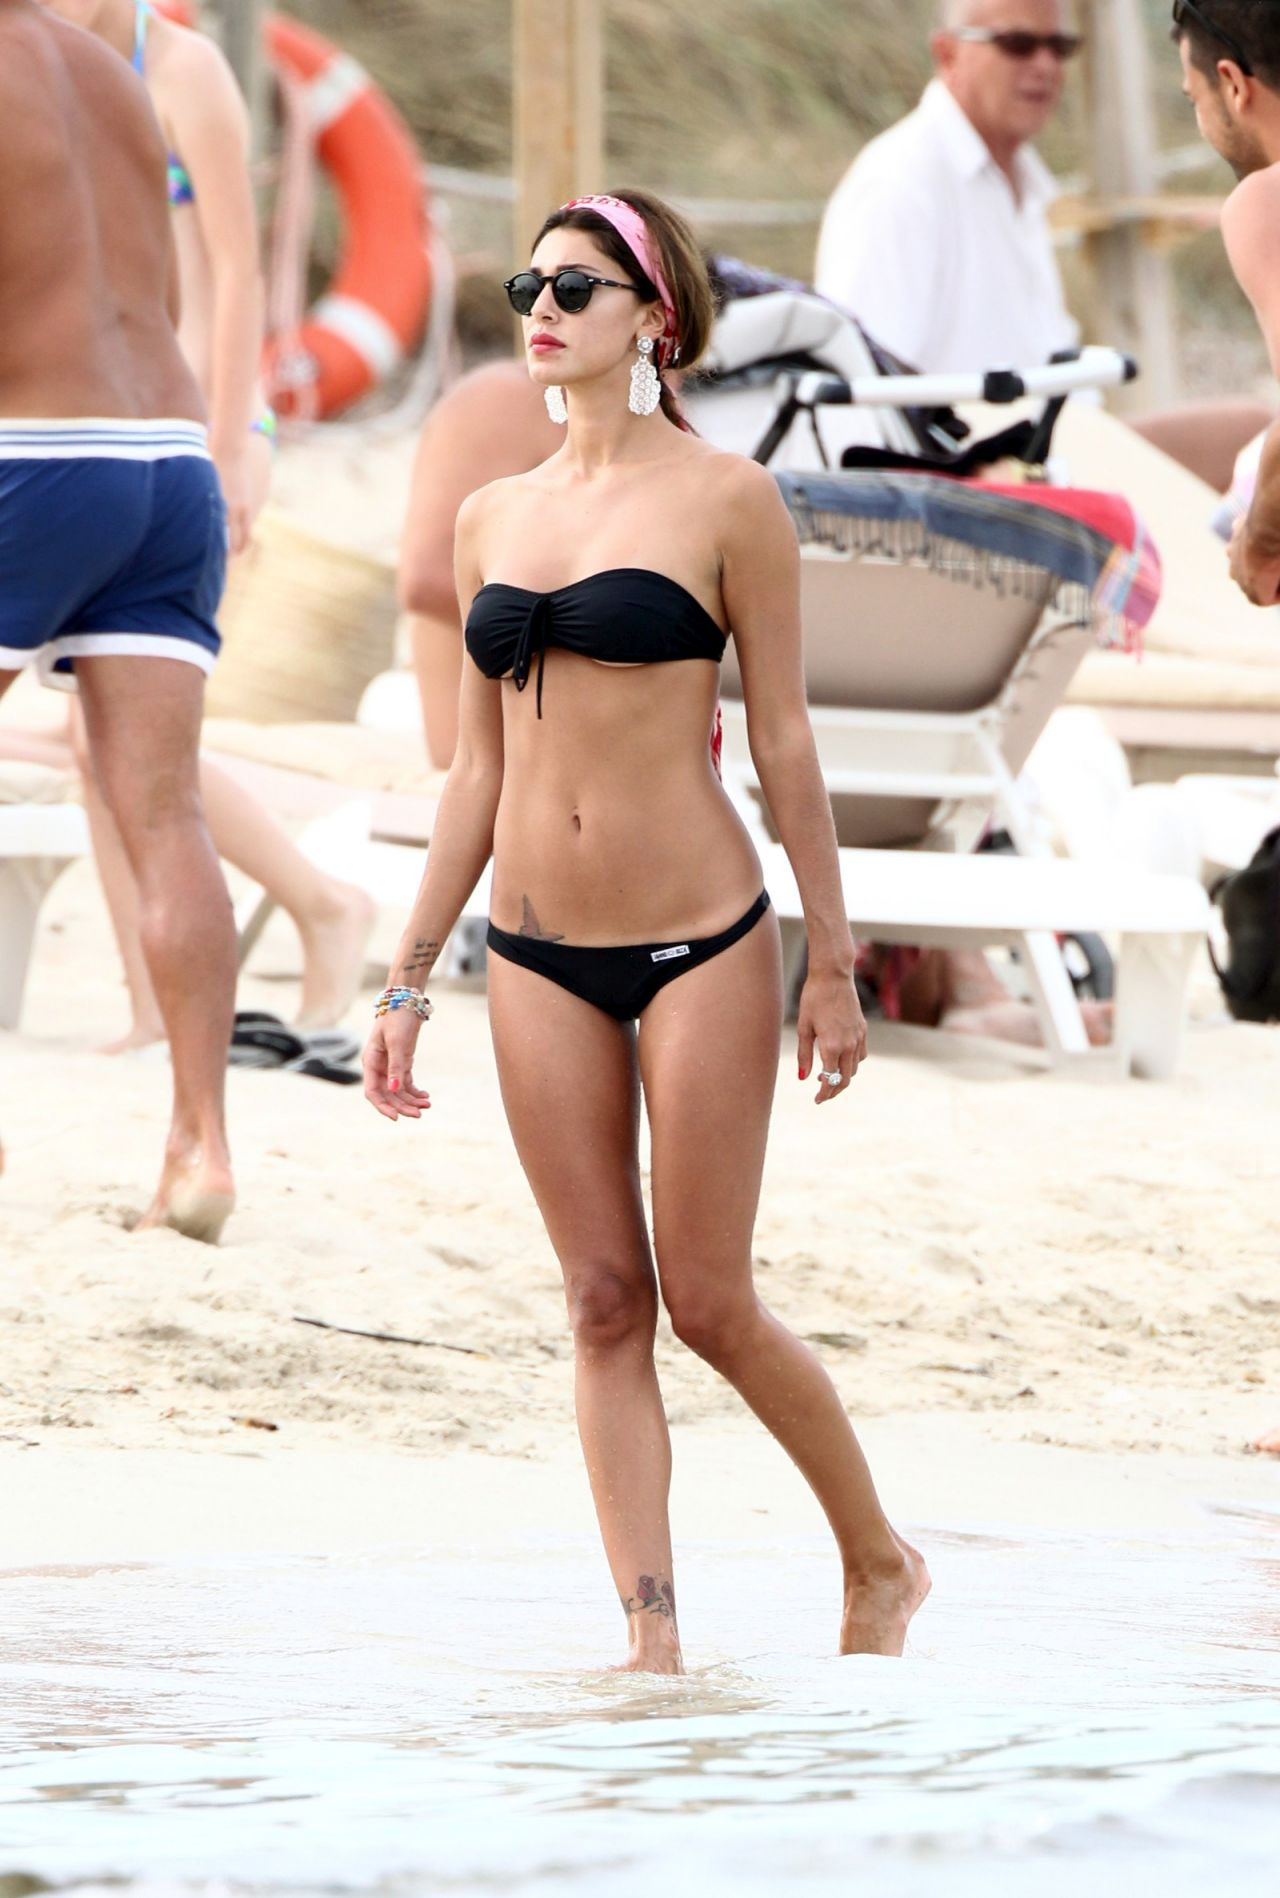 Bikini Belen Rodriguez naked (98 photo), Topless, Leaked, Selfie, braless 2020